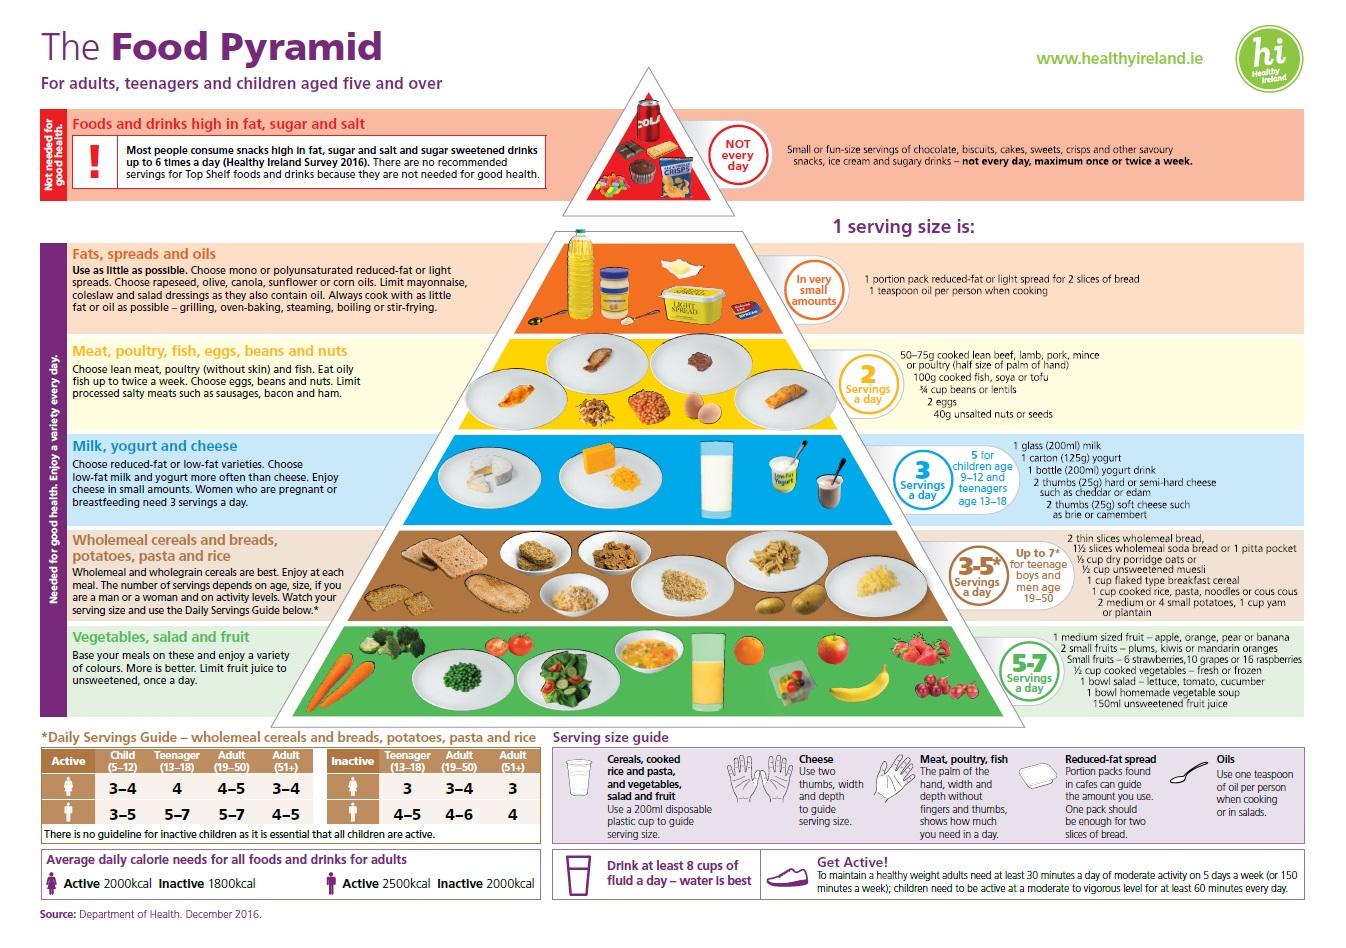 Food Pyramid Professional Version